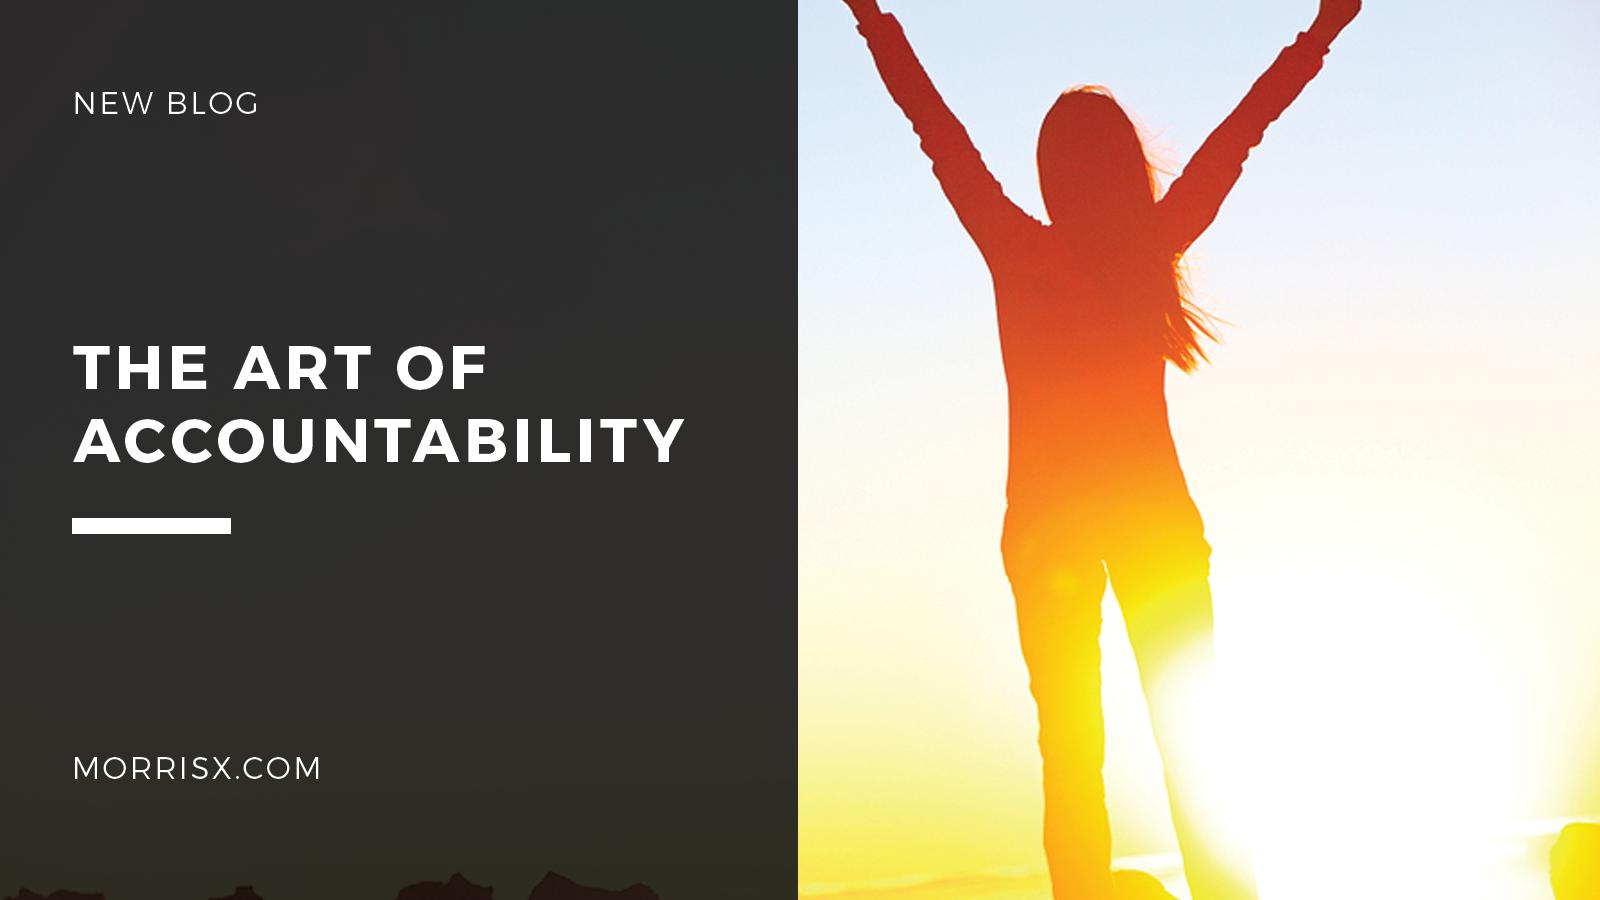 The Art of Accountability